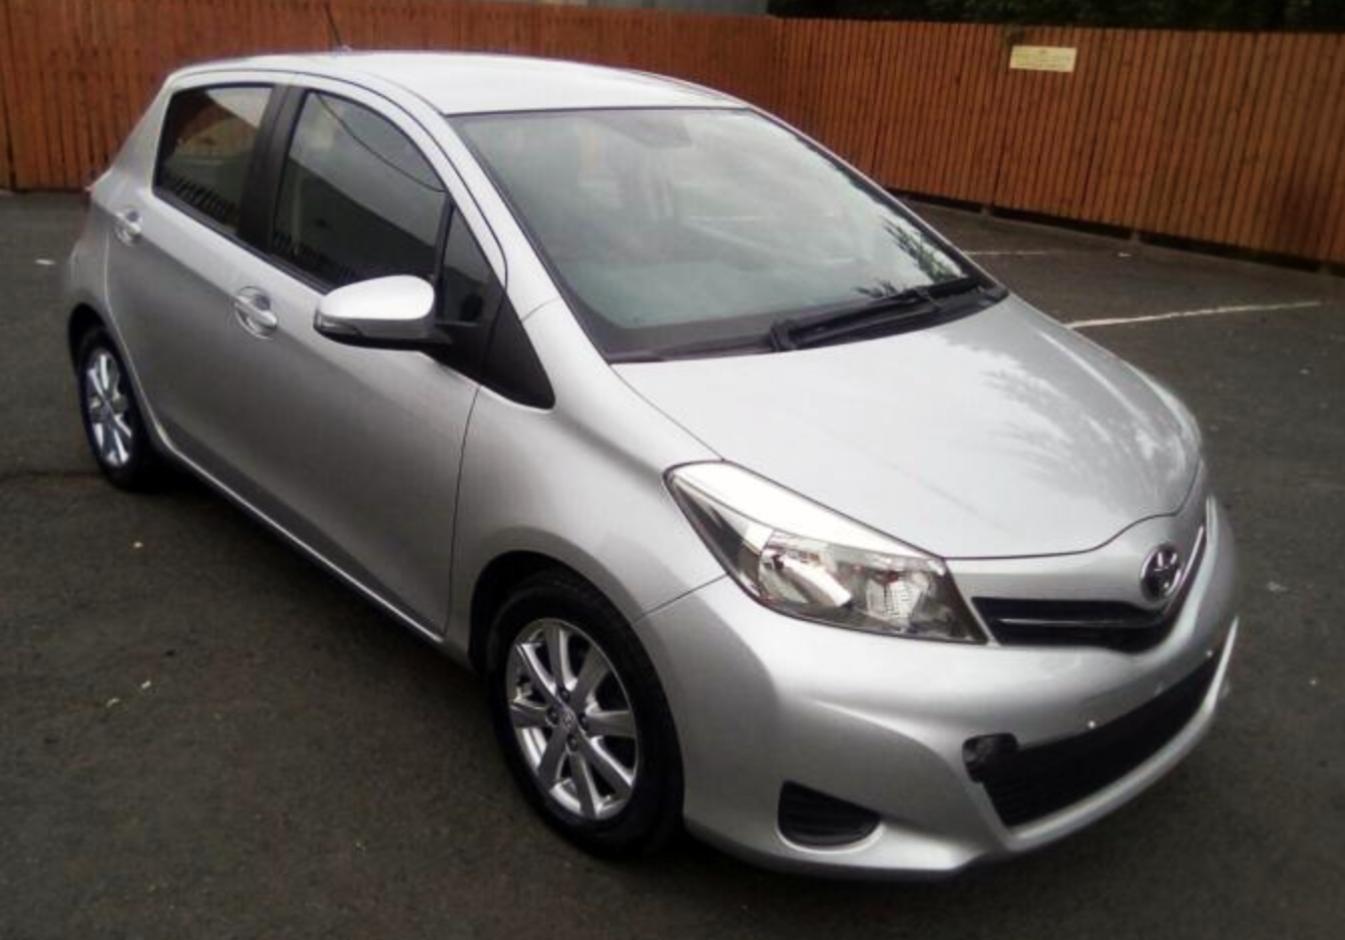 Picture of John's 2012 Toyota Yaris